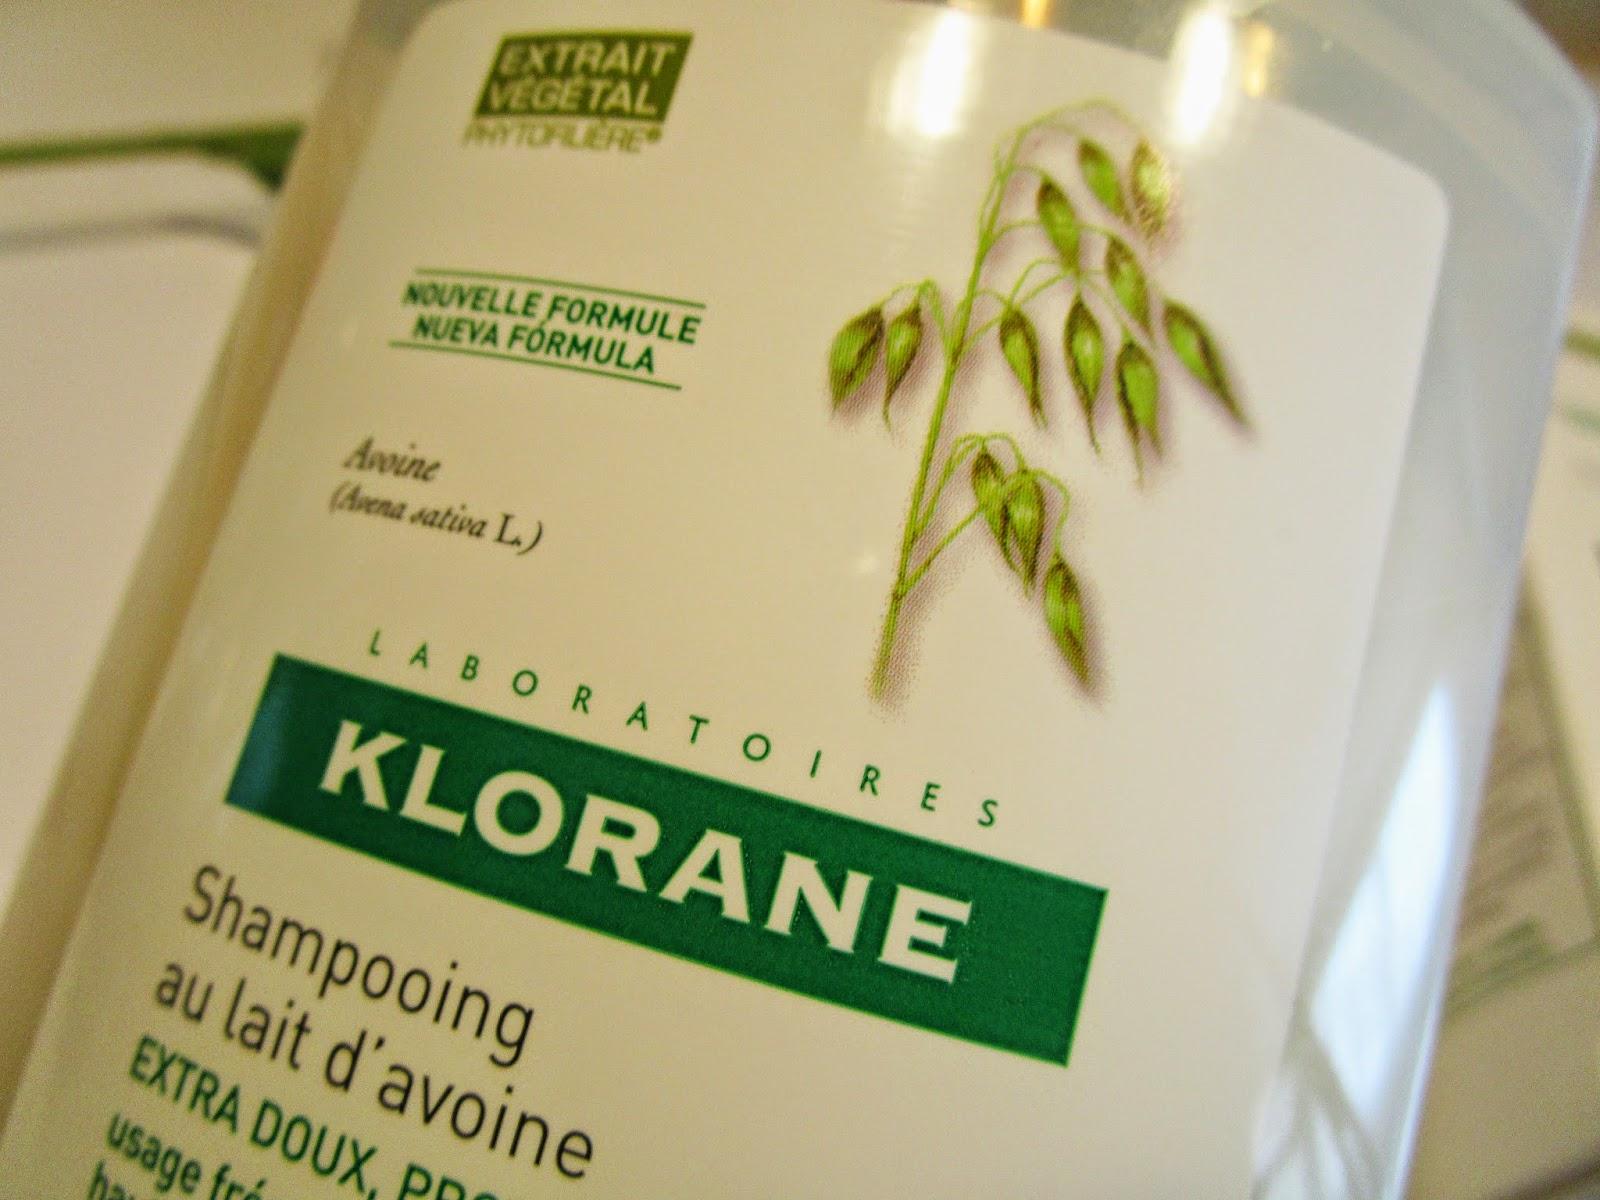 Champú Extra-suave a la Leche de Avena de Klorane,